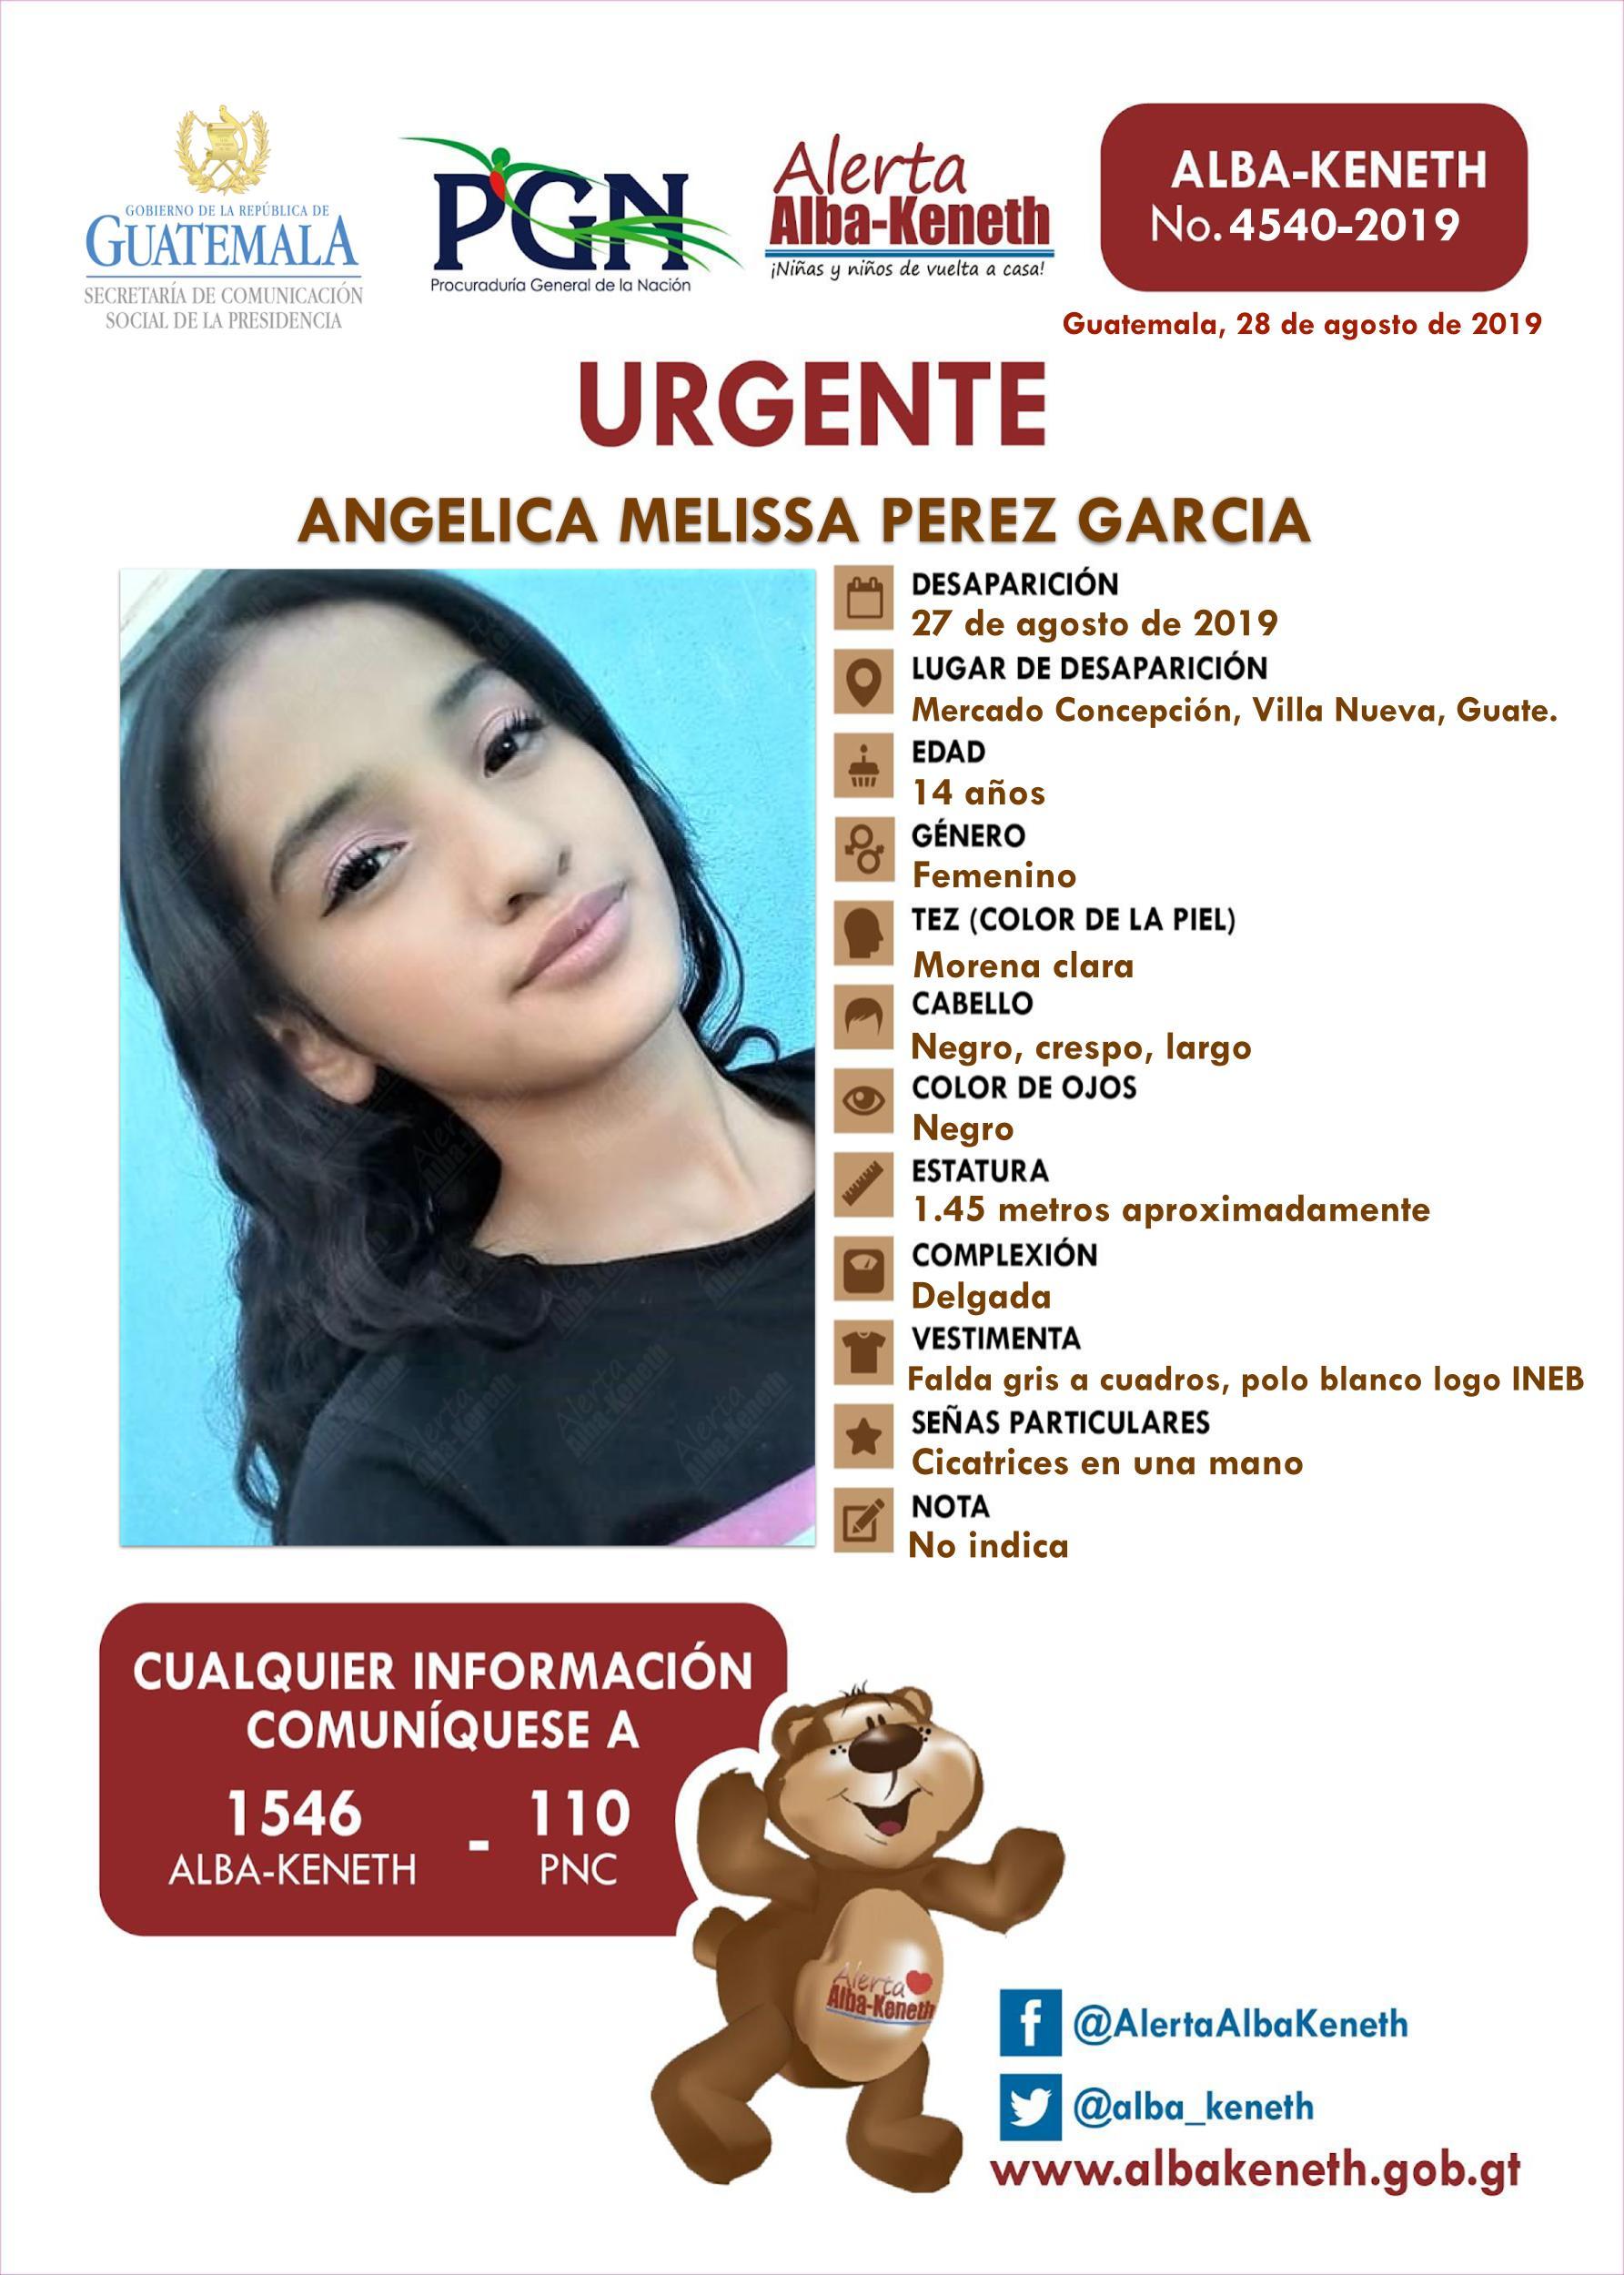 Angelica Melissa Perez Garcia